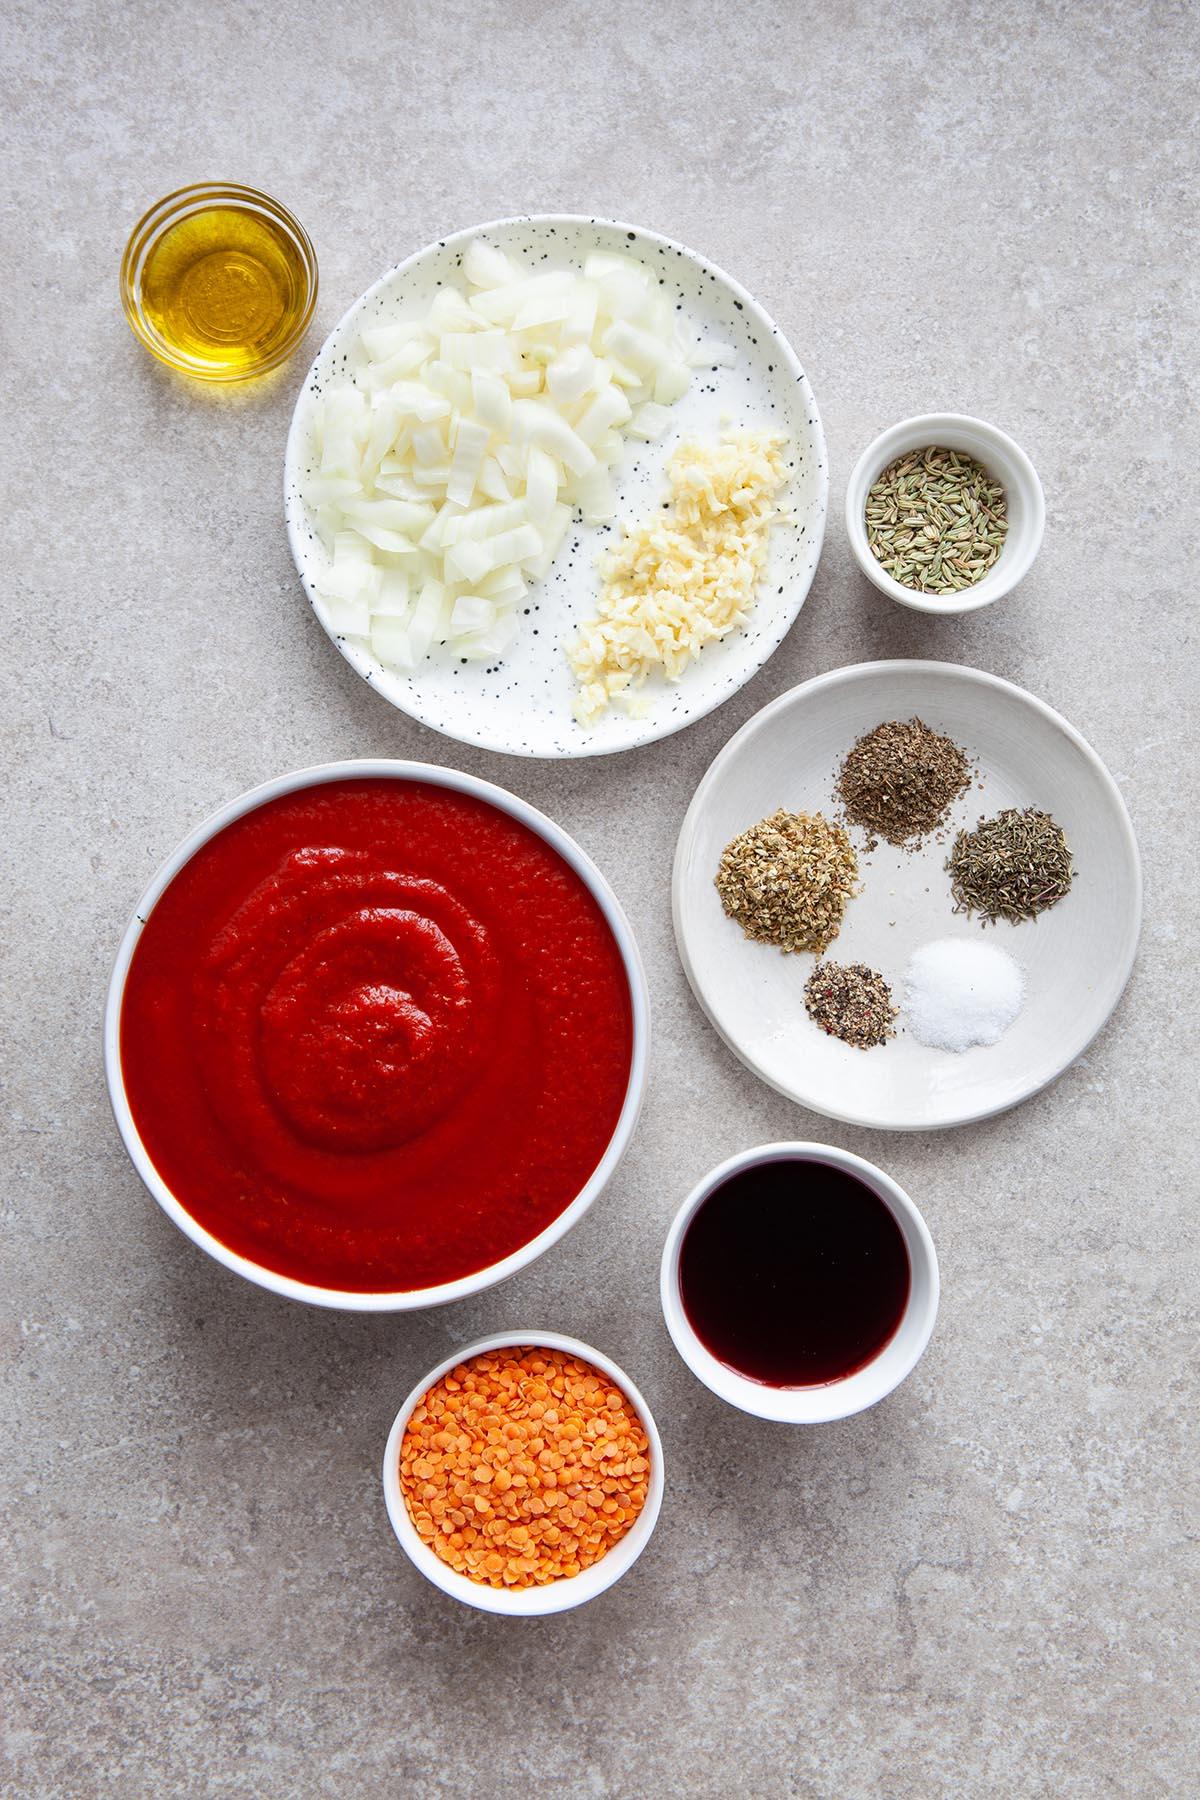 Pasta sauce ingredients.